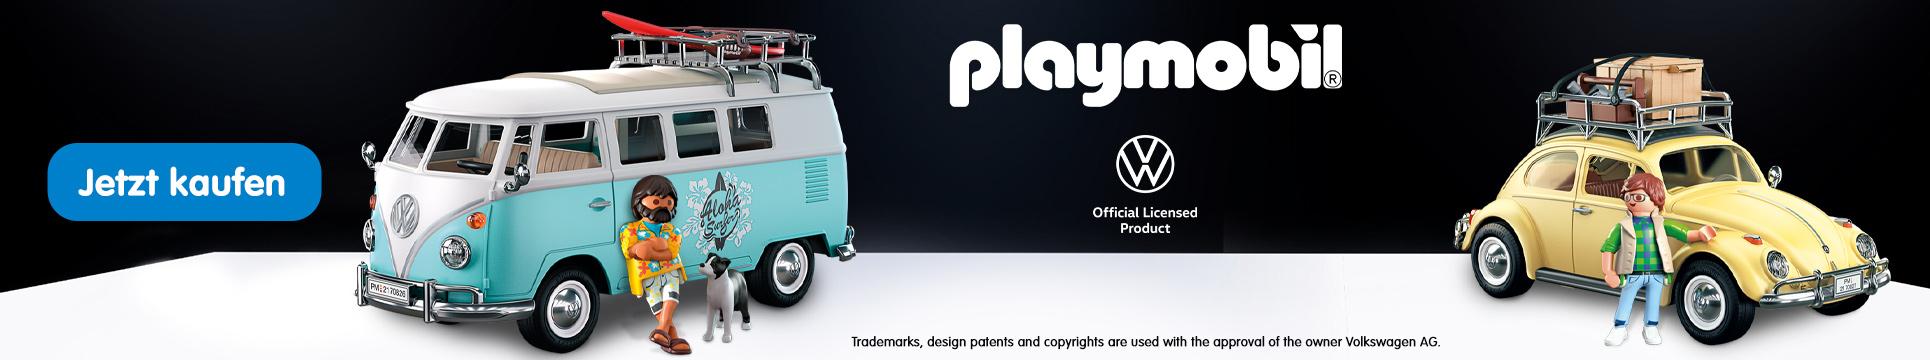 PlaymobilVW